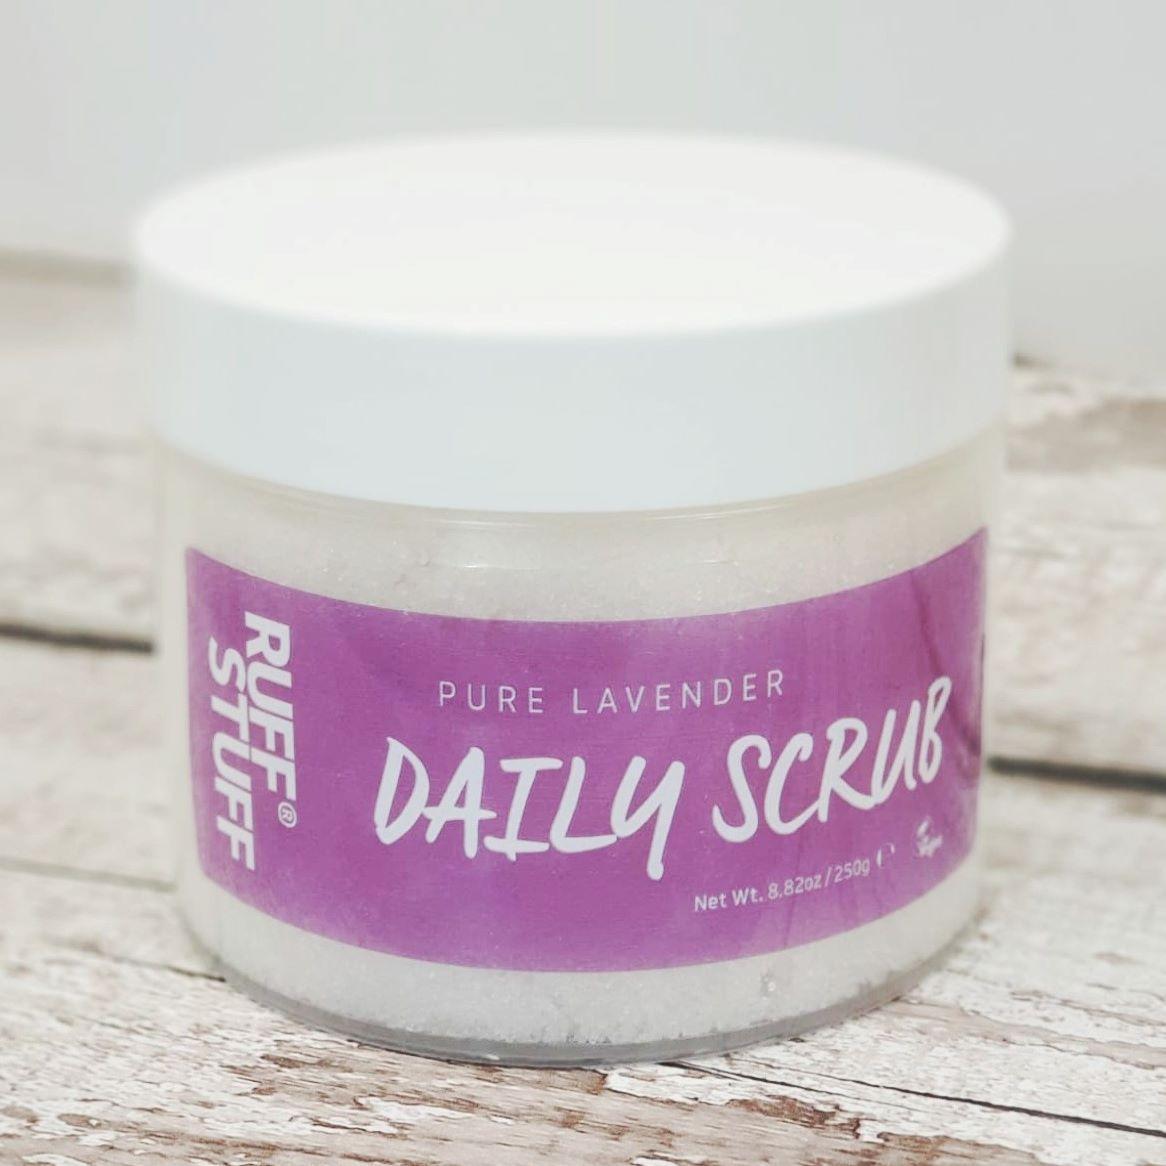 Daily Scrub 250g - Pure Lavender